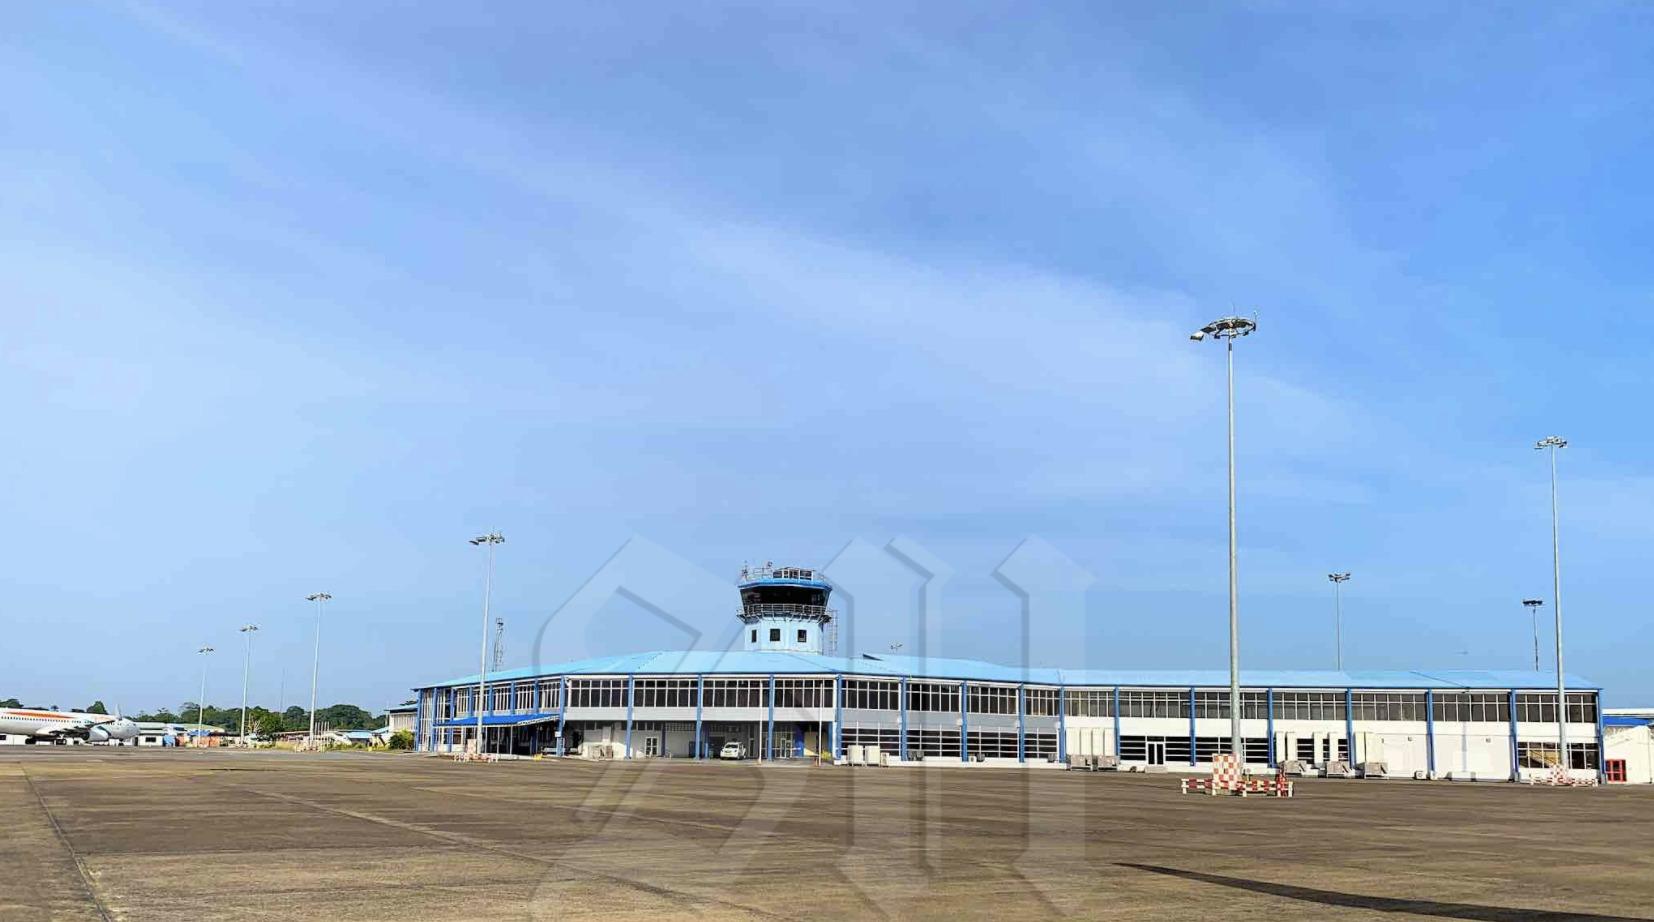 "Suriname Herald, ""Suriname Closes Borders for Travelers from Midnight,"" 13 March 2020, https://www.srherald.com/suriname/2020/03/13/suriname-sluit-vanaf-middernacht-grenzen-voor-reizigers/"